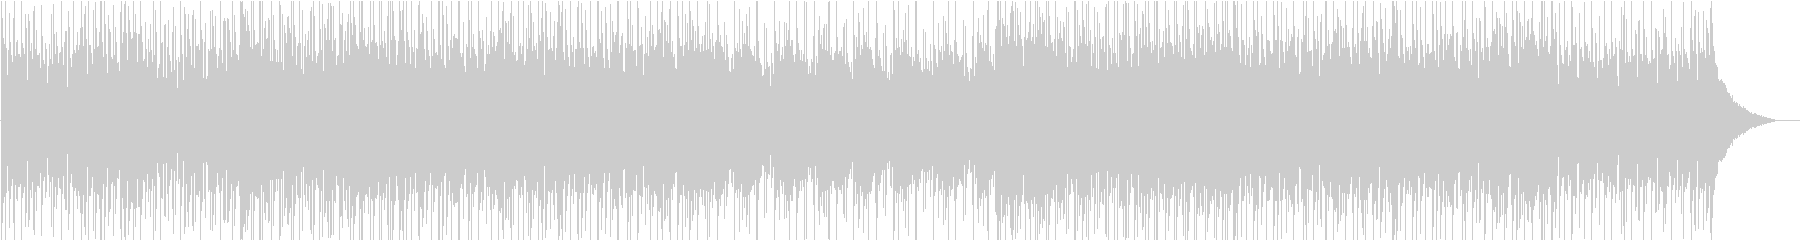 J−POPな曲調のBGMの未再生の波形